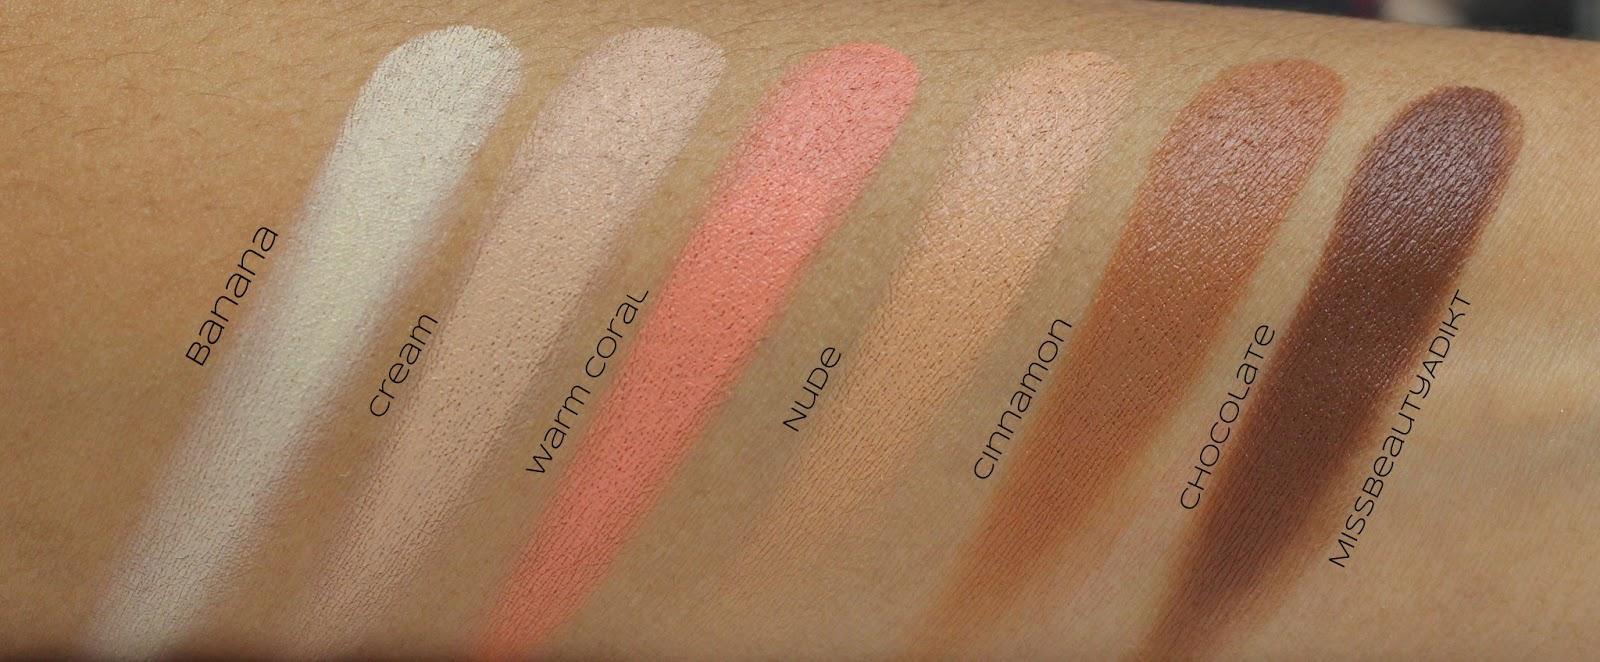 Powder Contour Kit - Light To Medium by Anastasia Beverly Hills #12